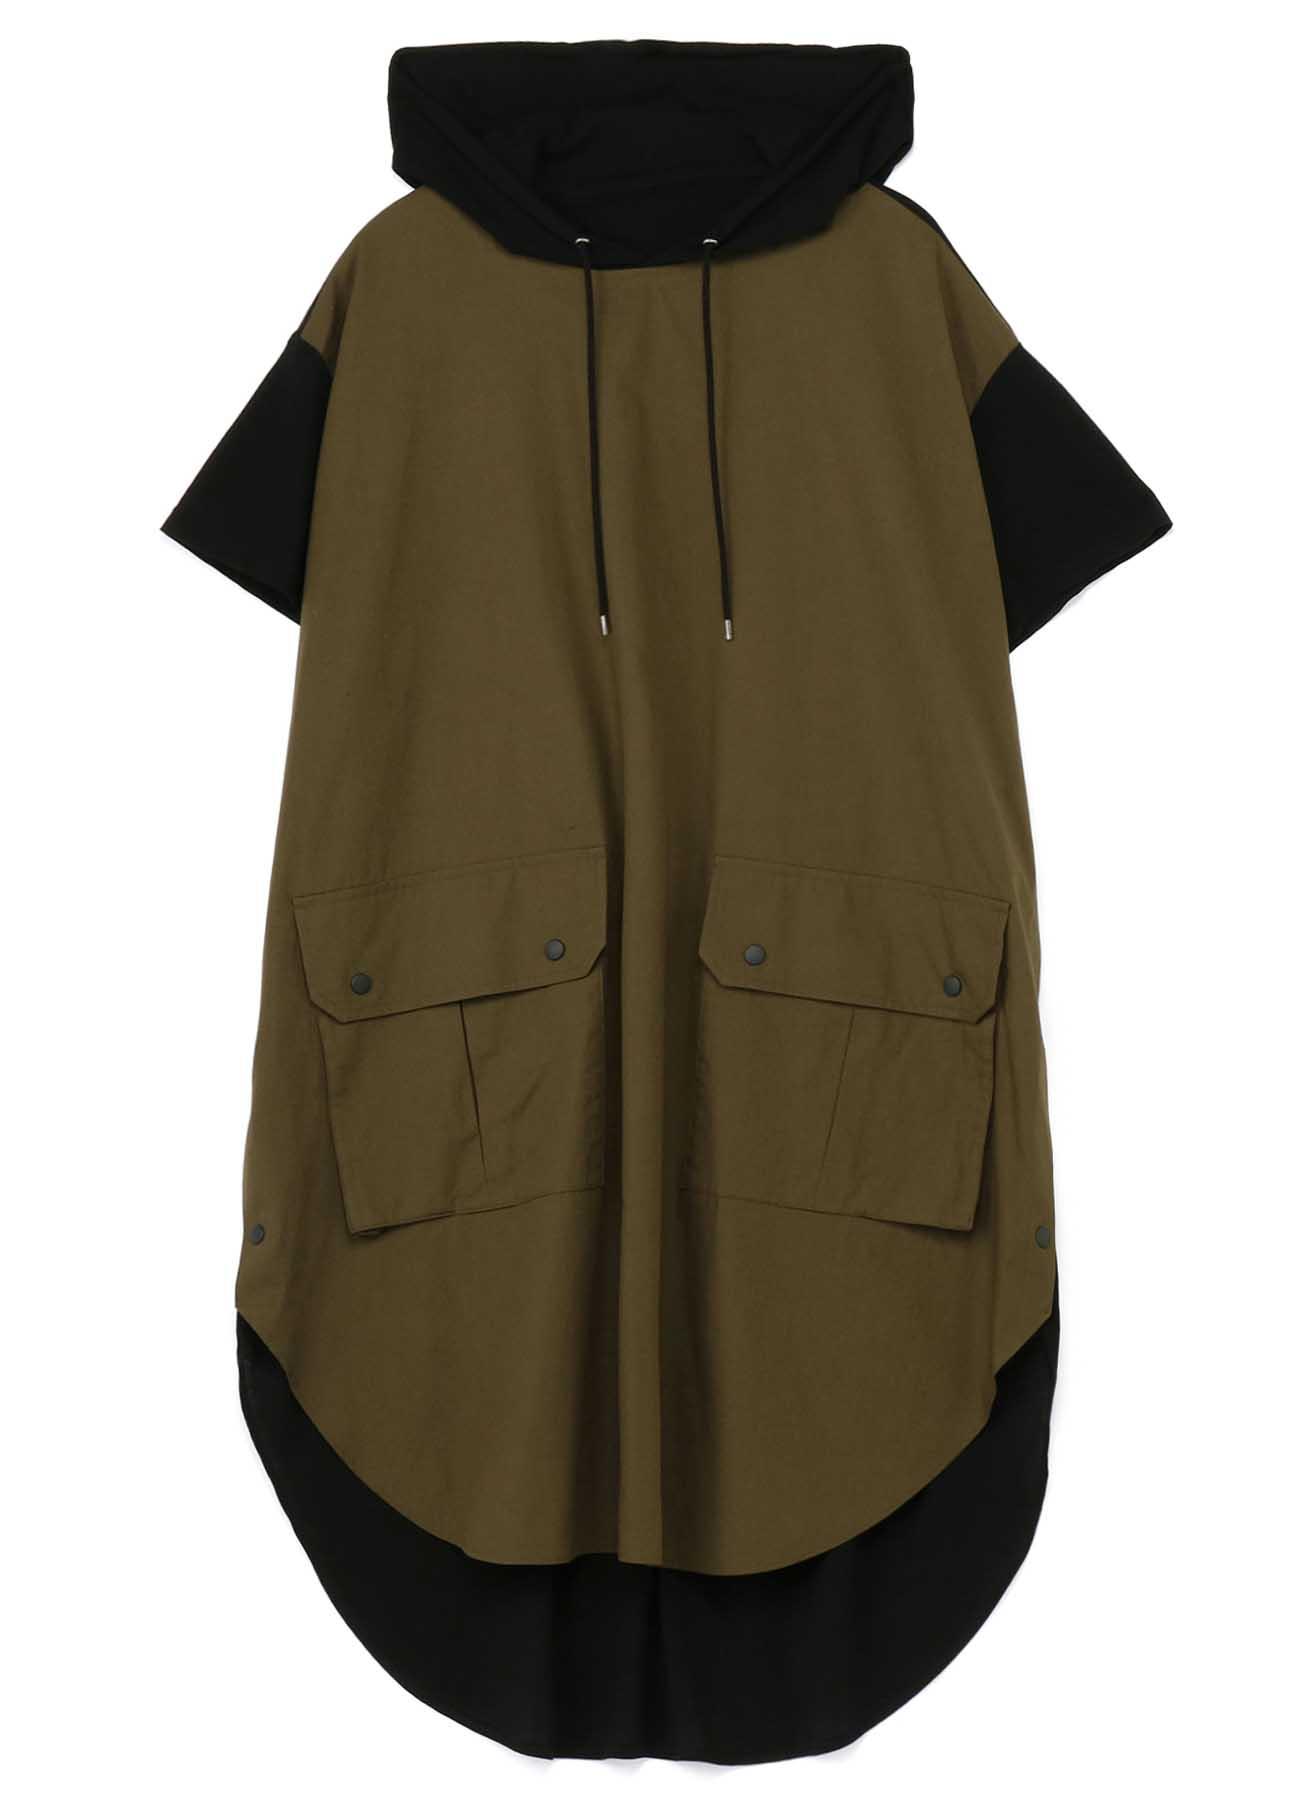 Big Hood Short Sleeves Dress